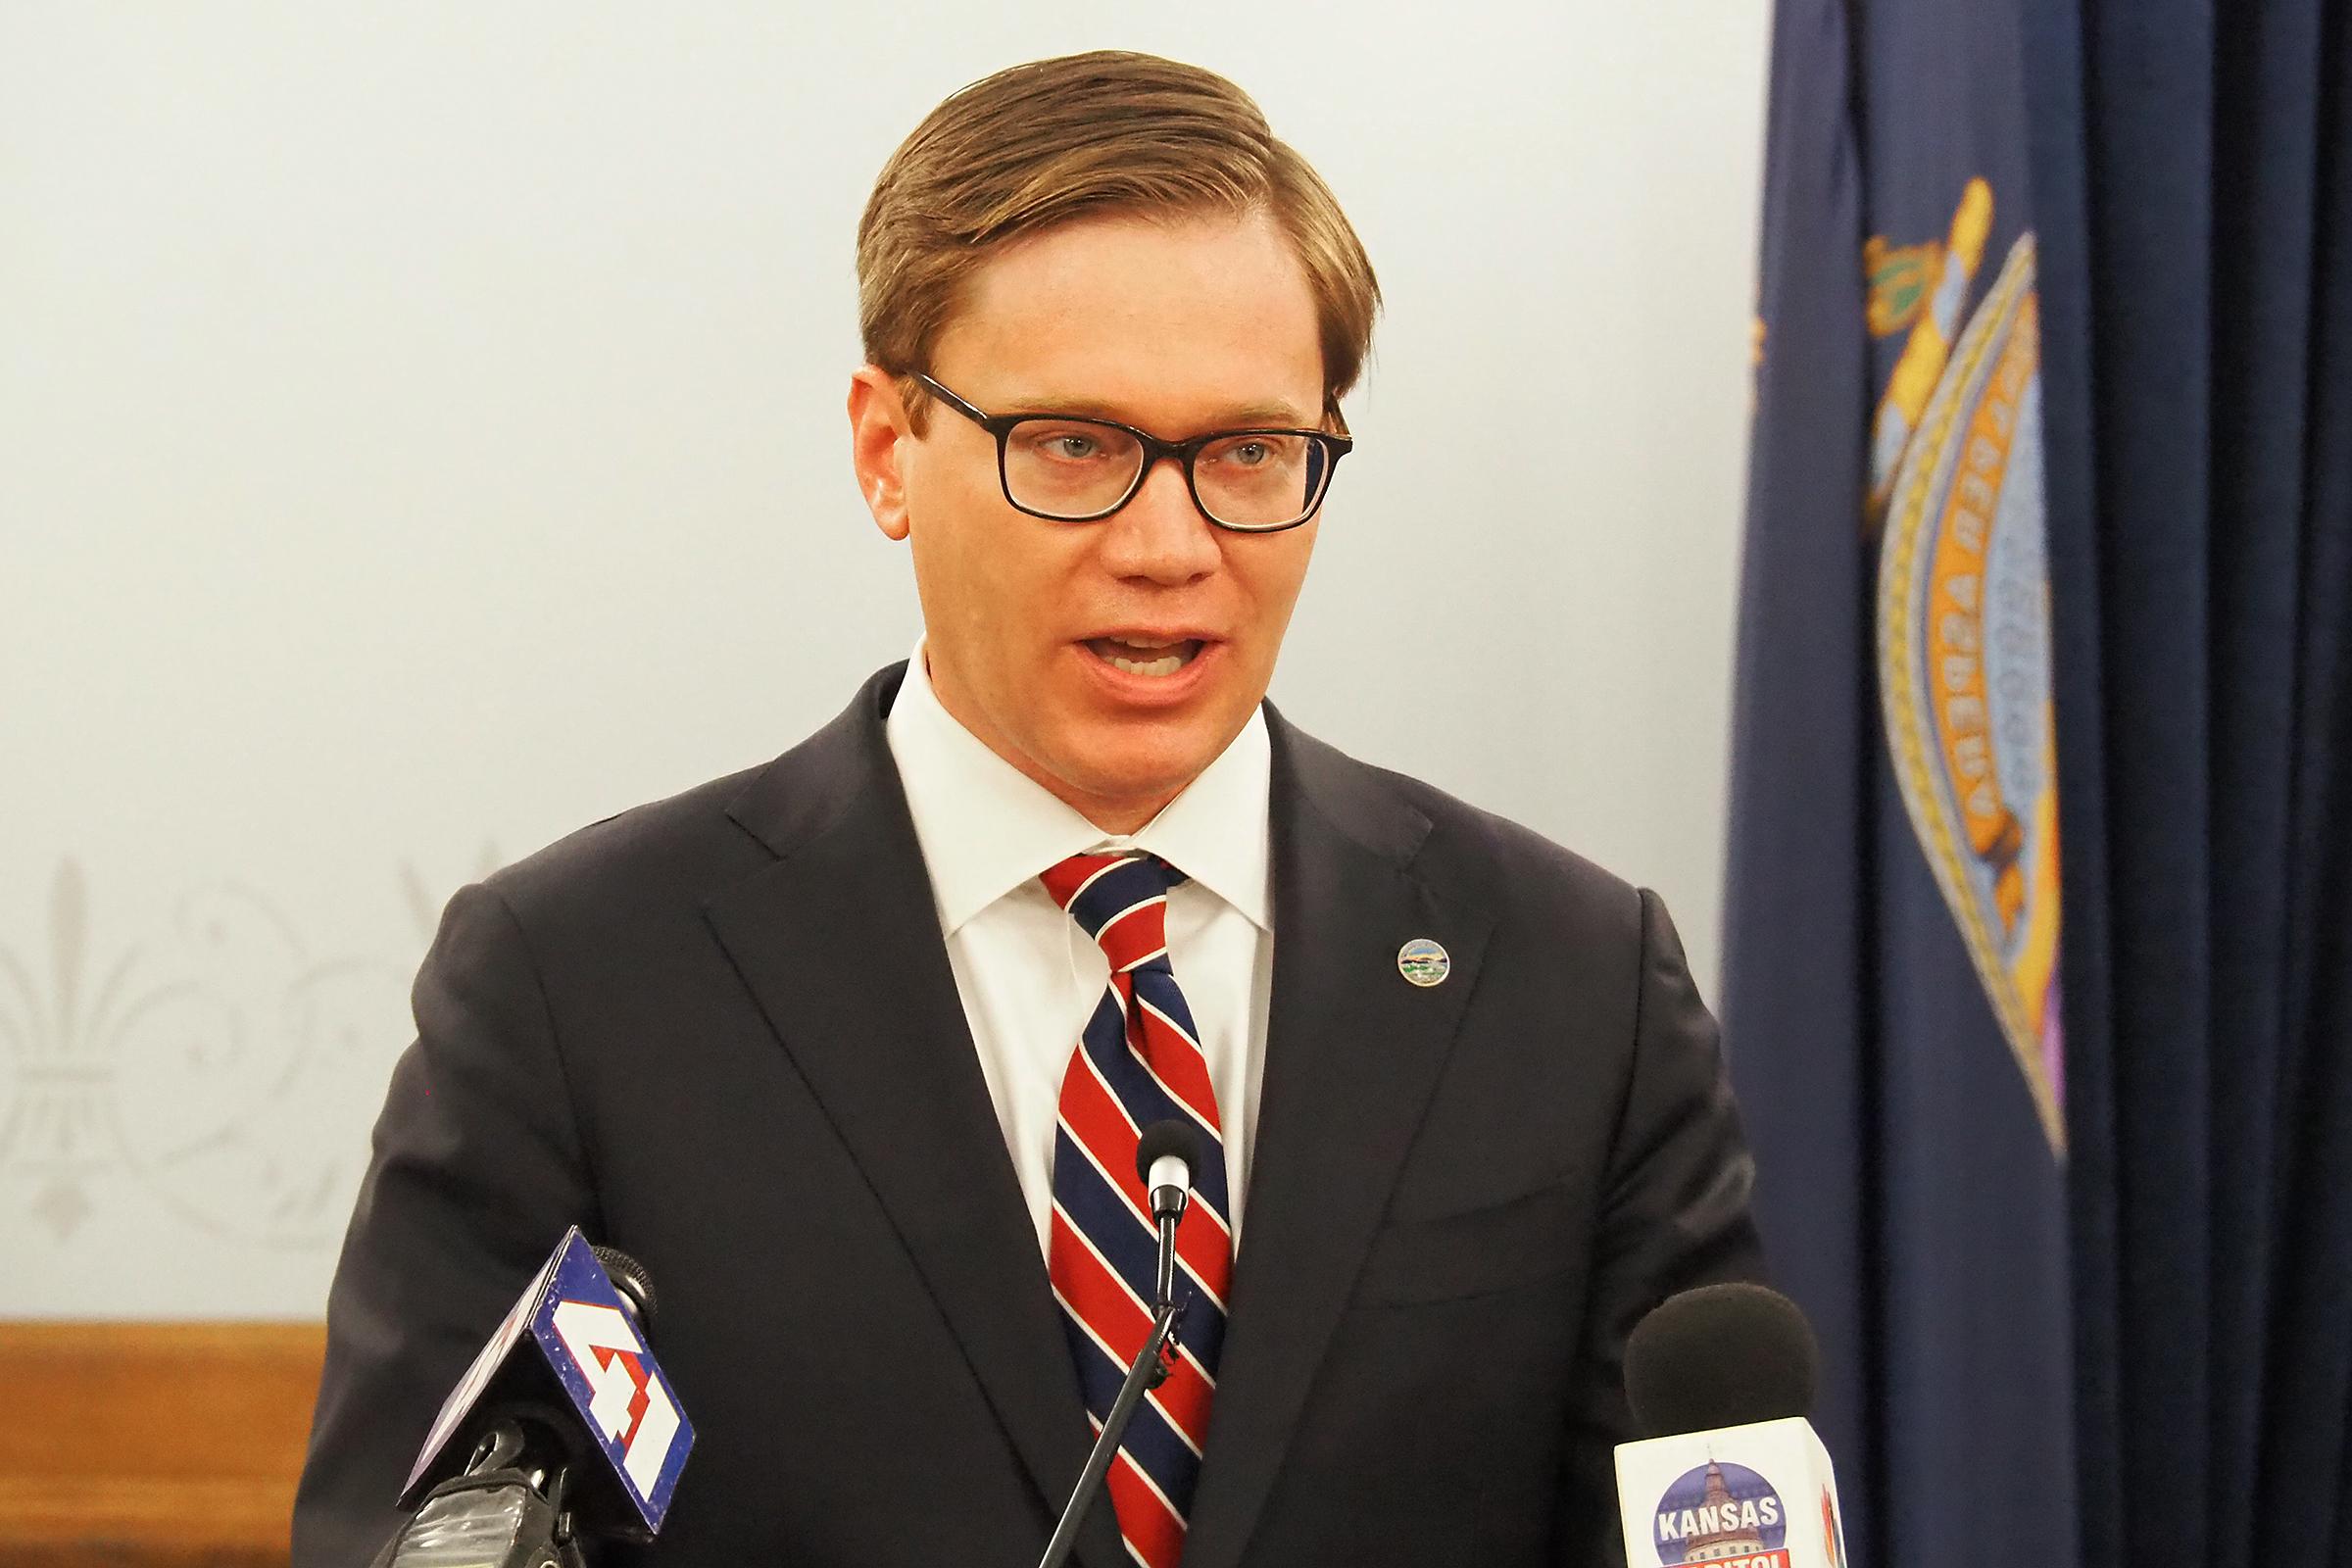 Kansas communities set for broadband improvements following first round of state grants